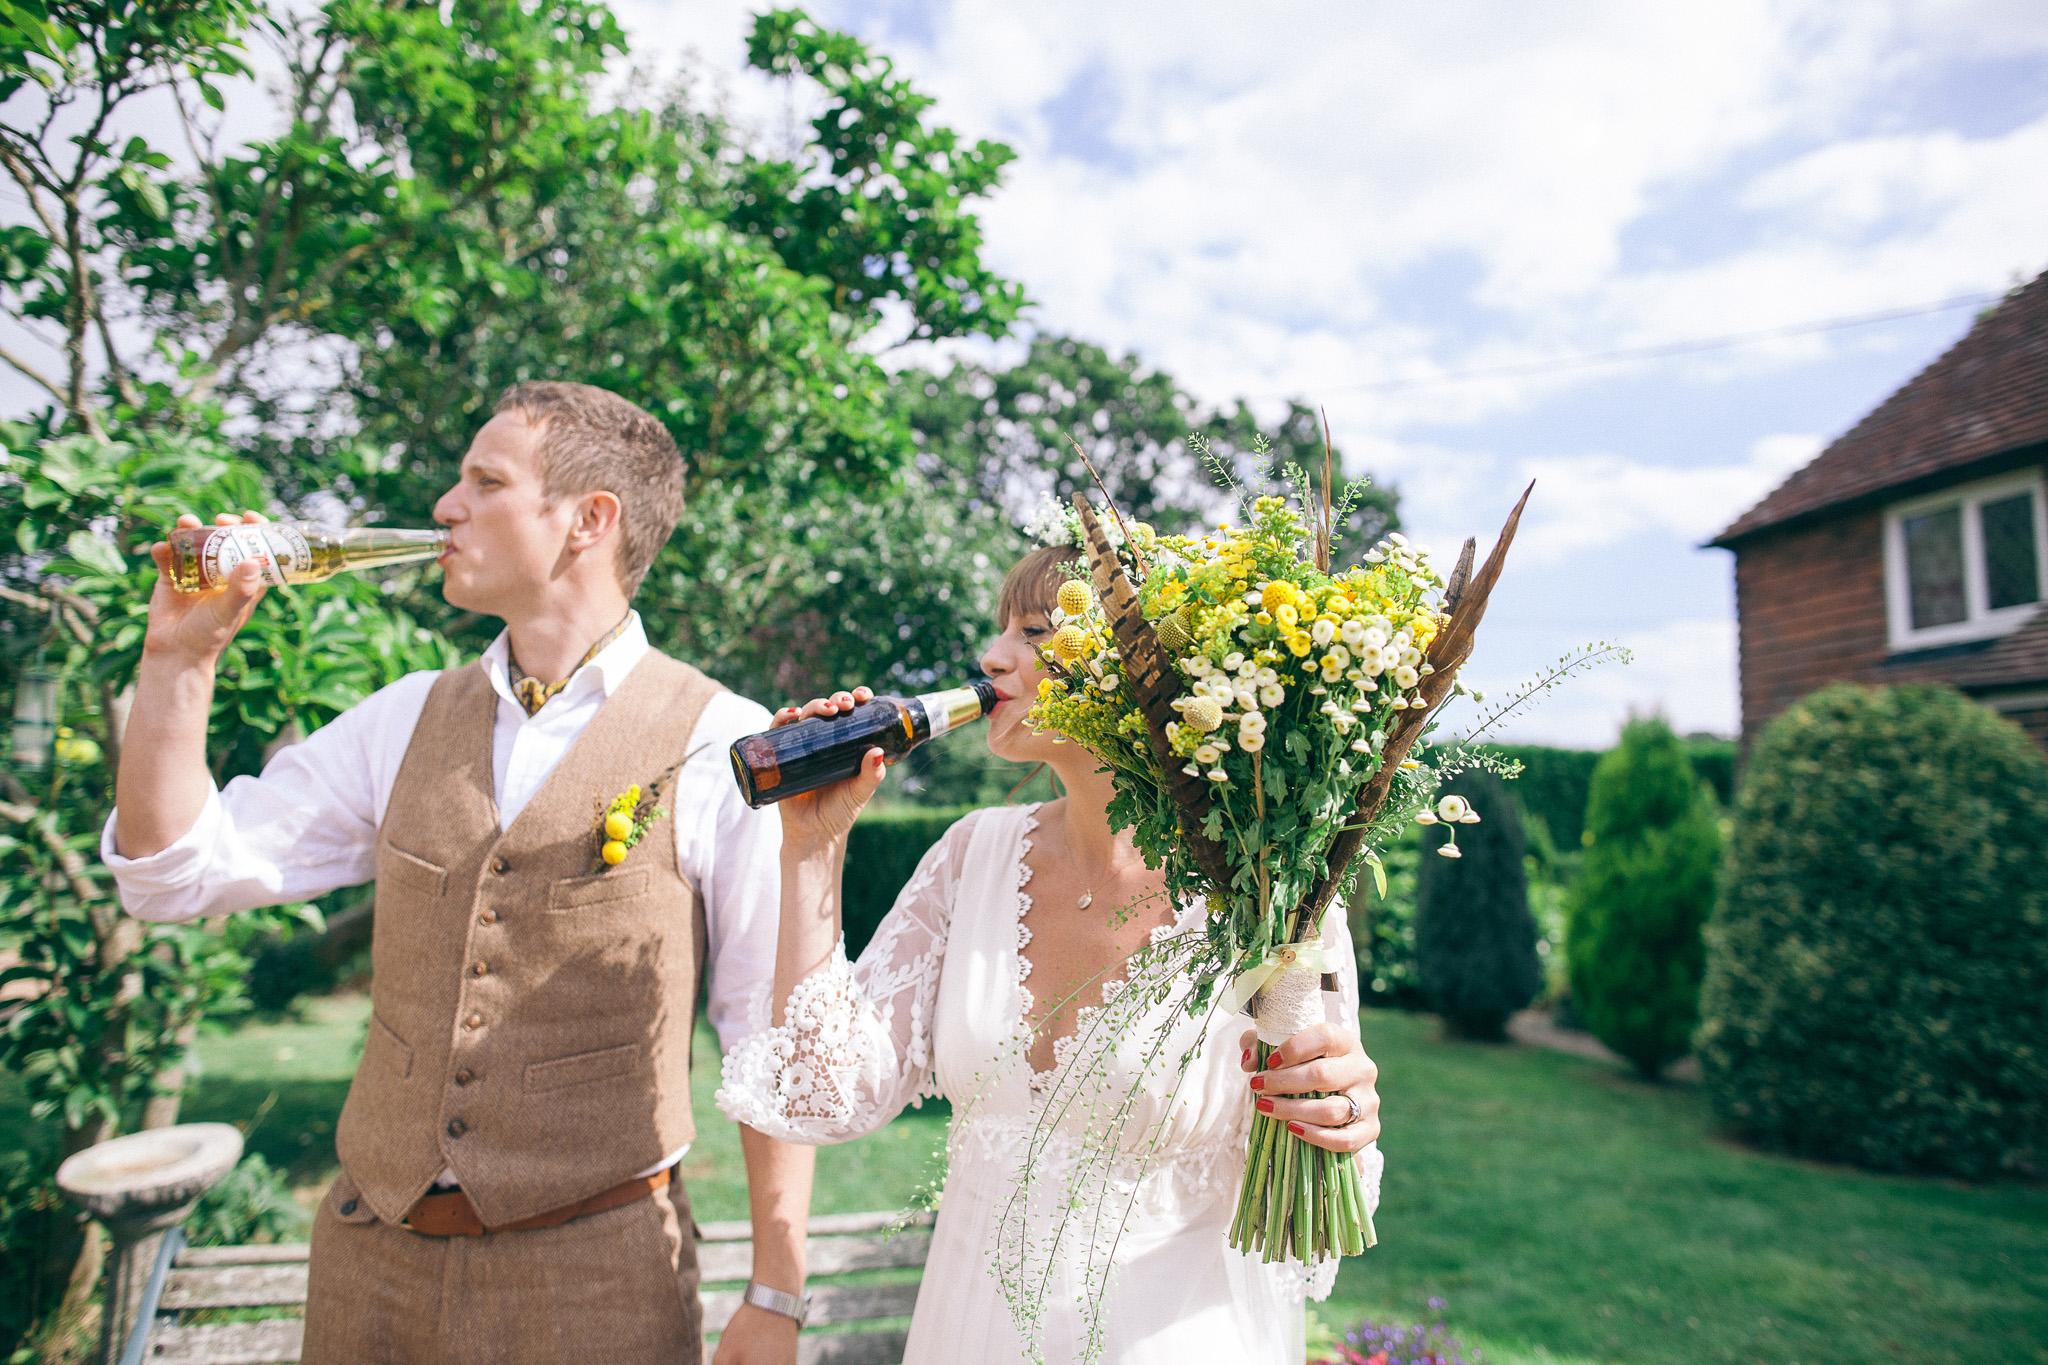 chantry_sussex_barn_wedding_334.jpg